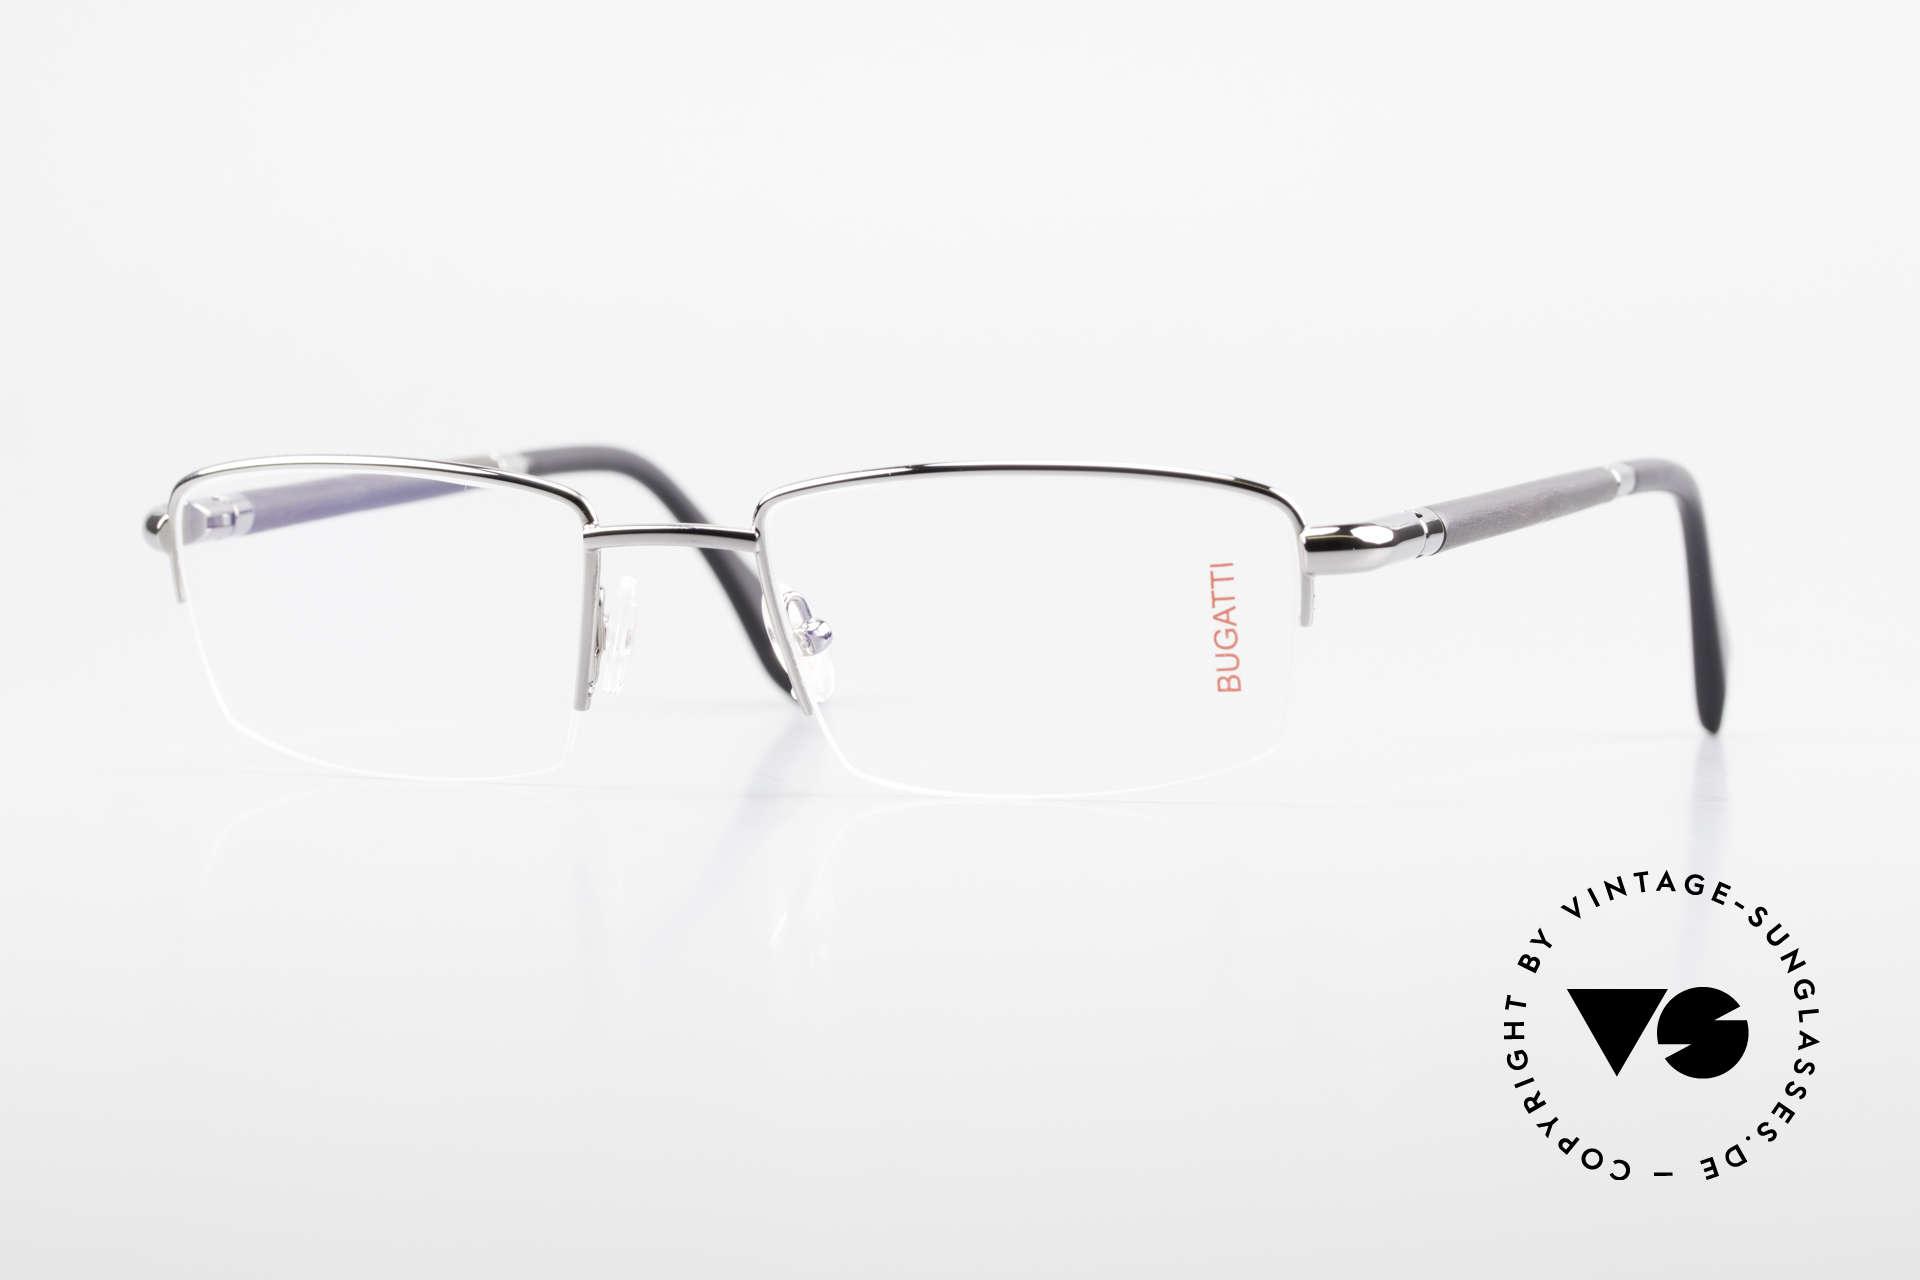 Bugatti 535 Horn Nylor Glasses Palladium, luxury eyeglasses by BUGATTI, TOP-NOTCH quality, Made for Men